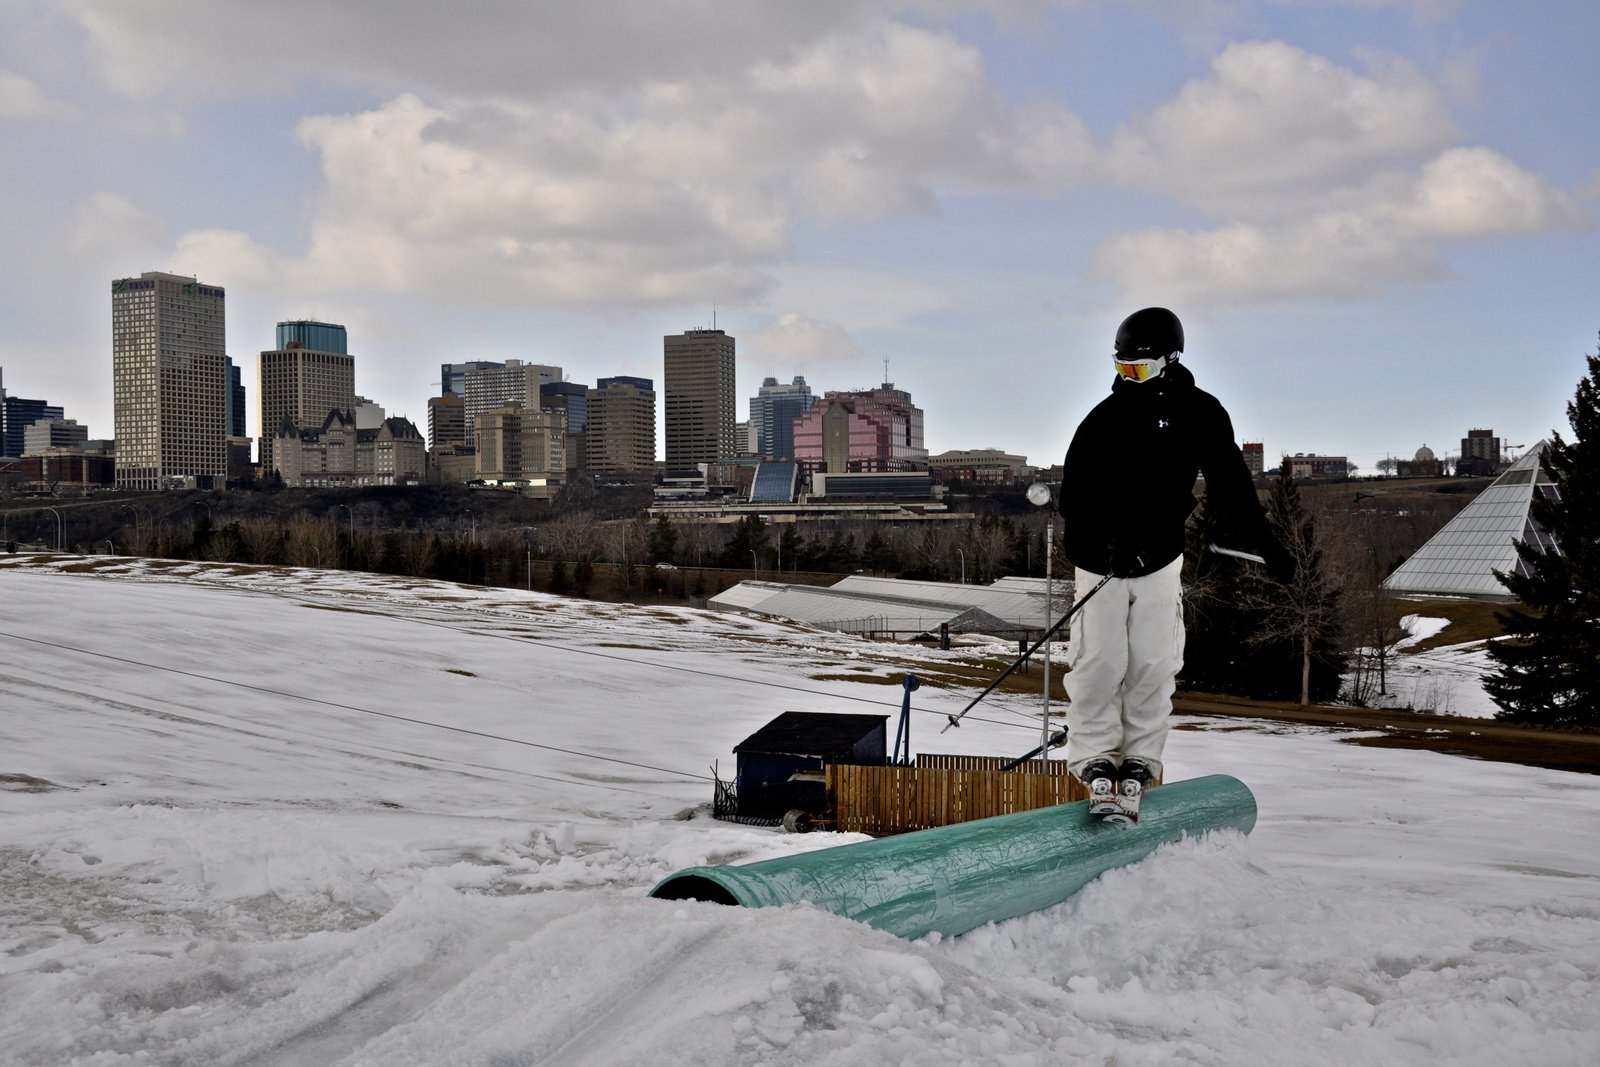 Late season ski